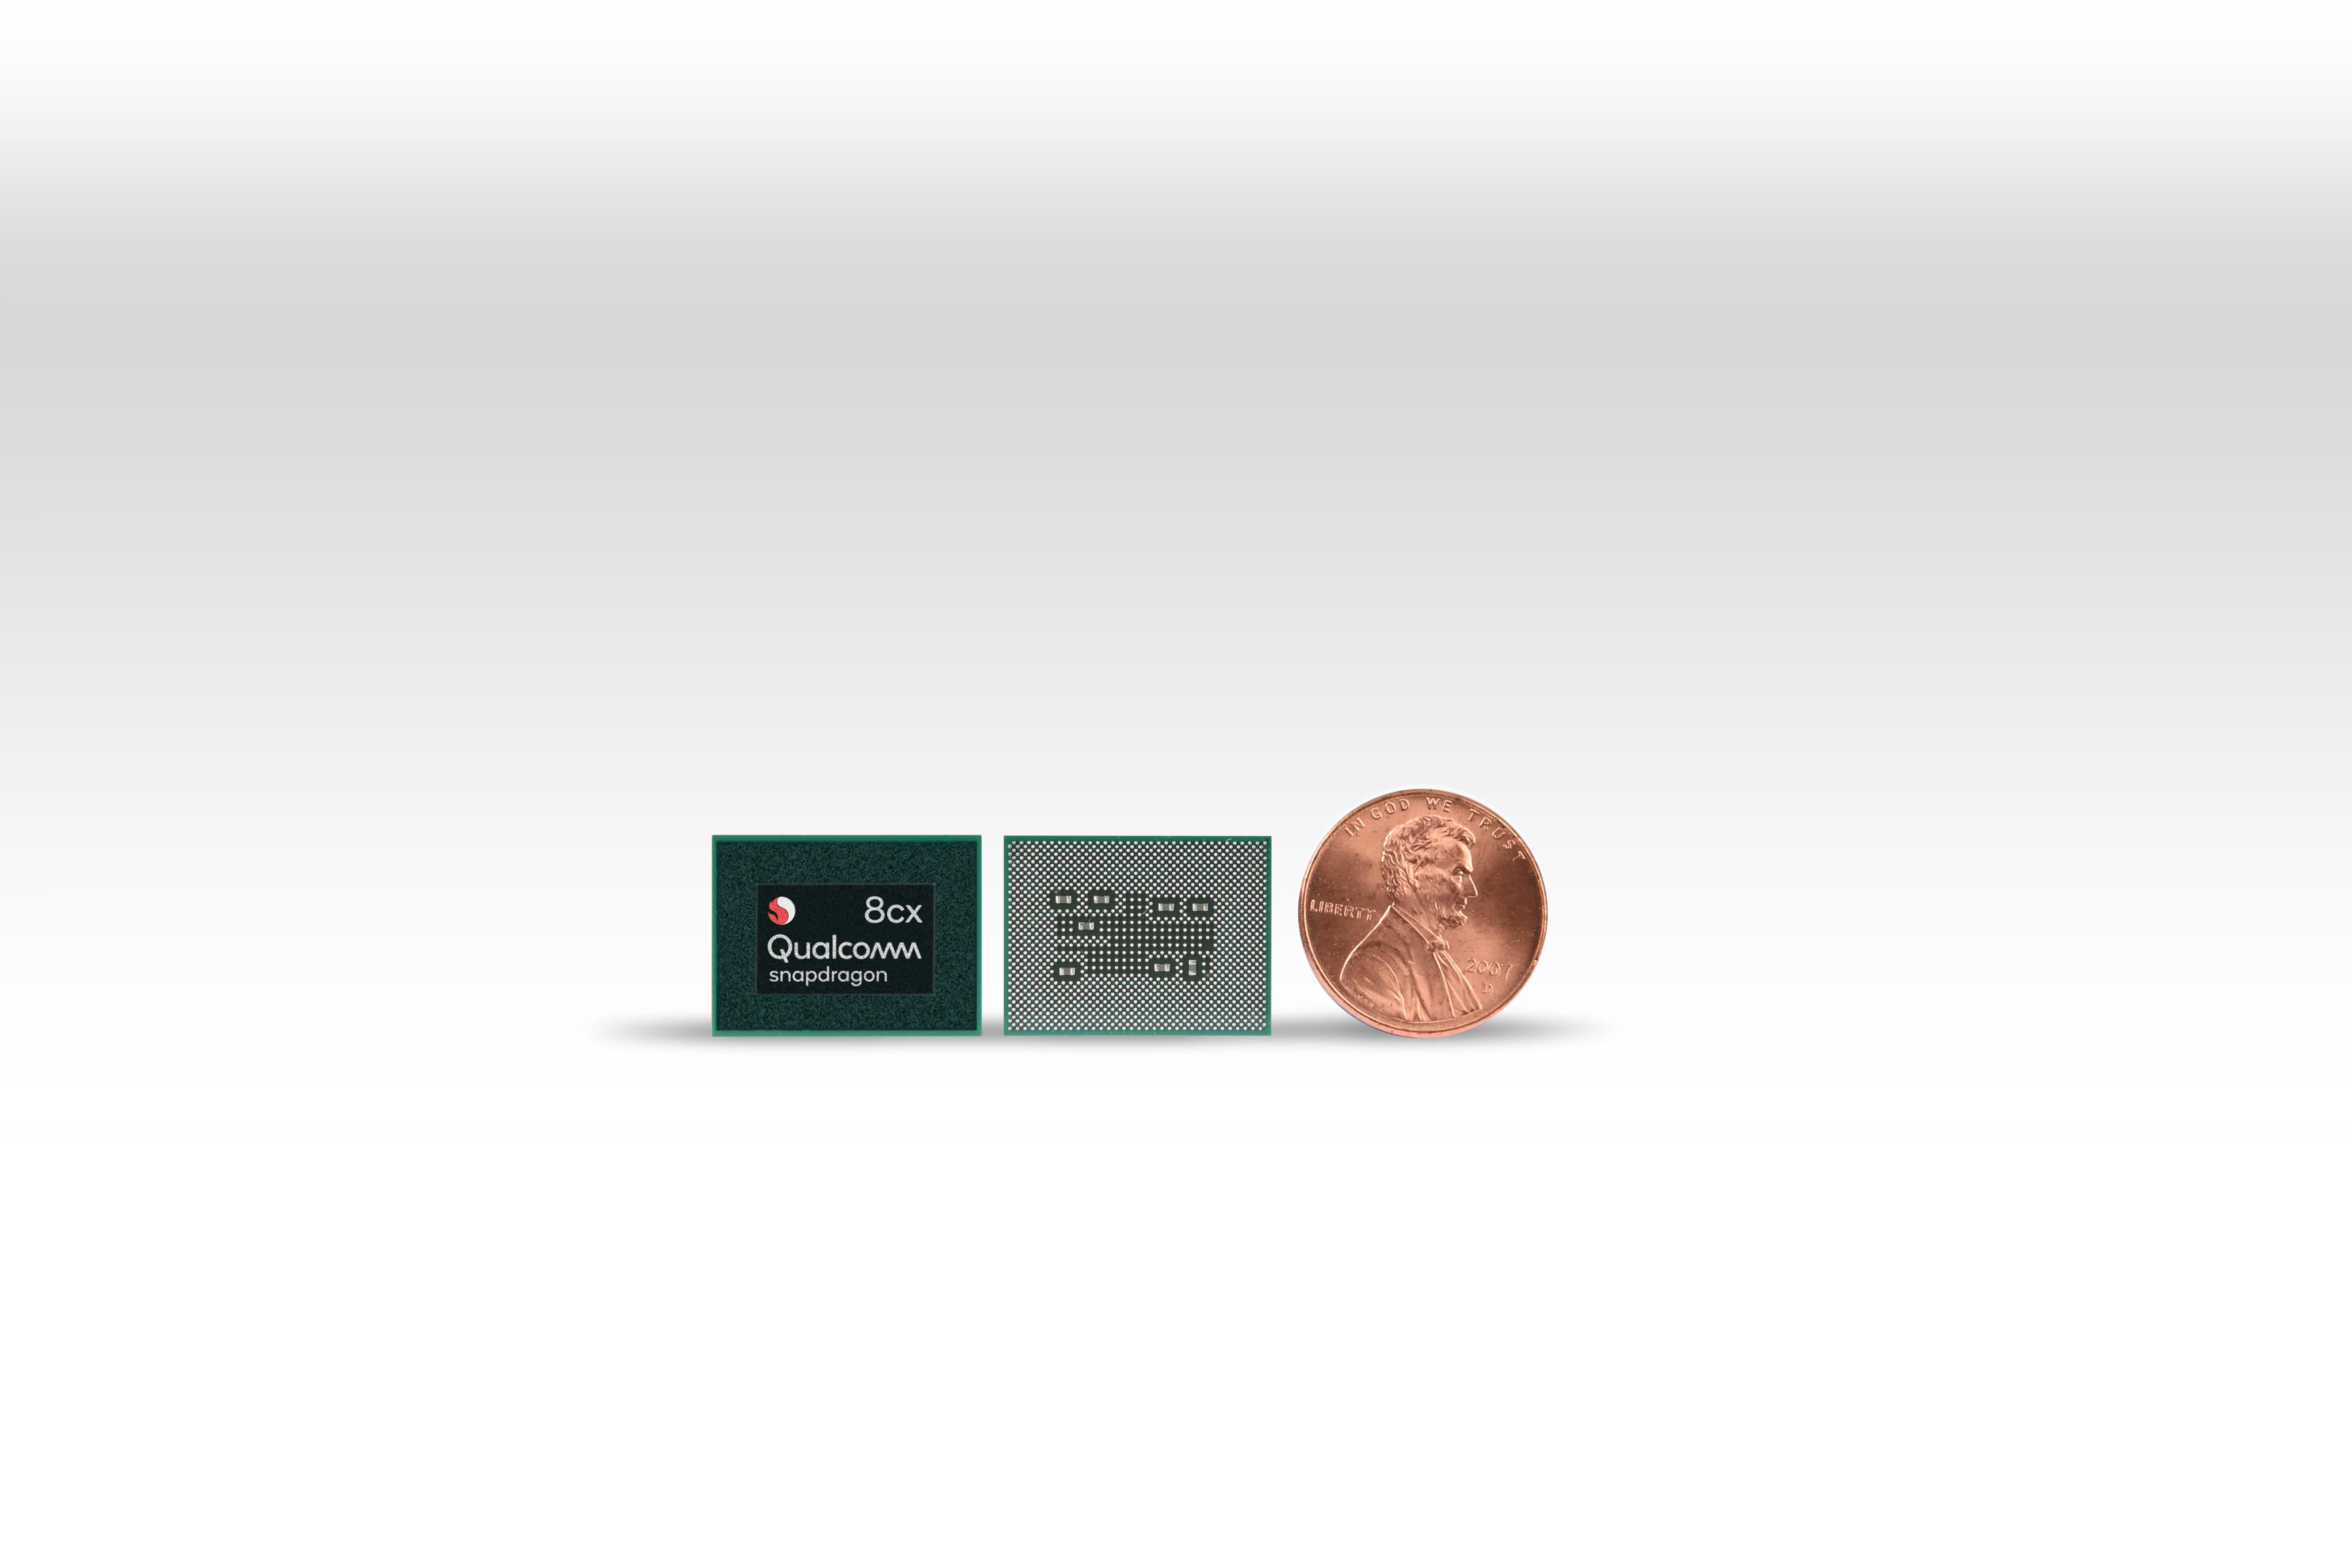 snapdragon-8cx-chip-comparison-us-coin.jpg